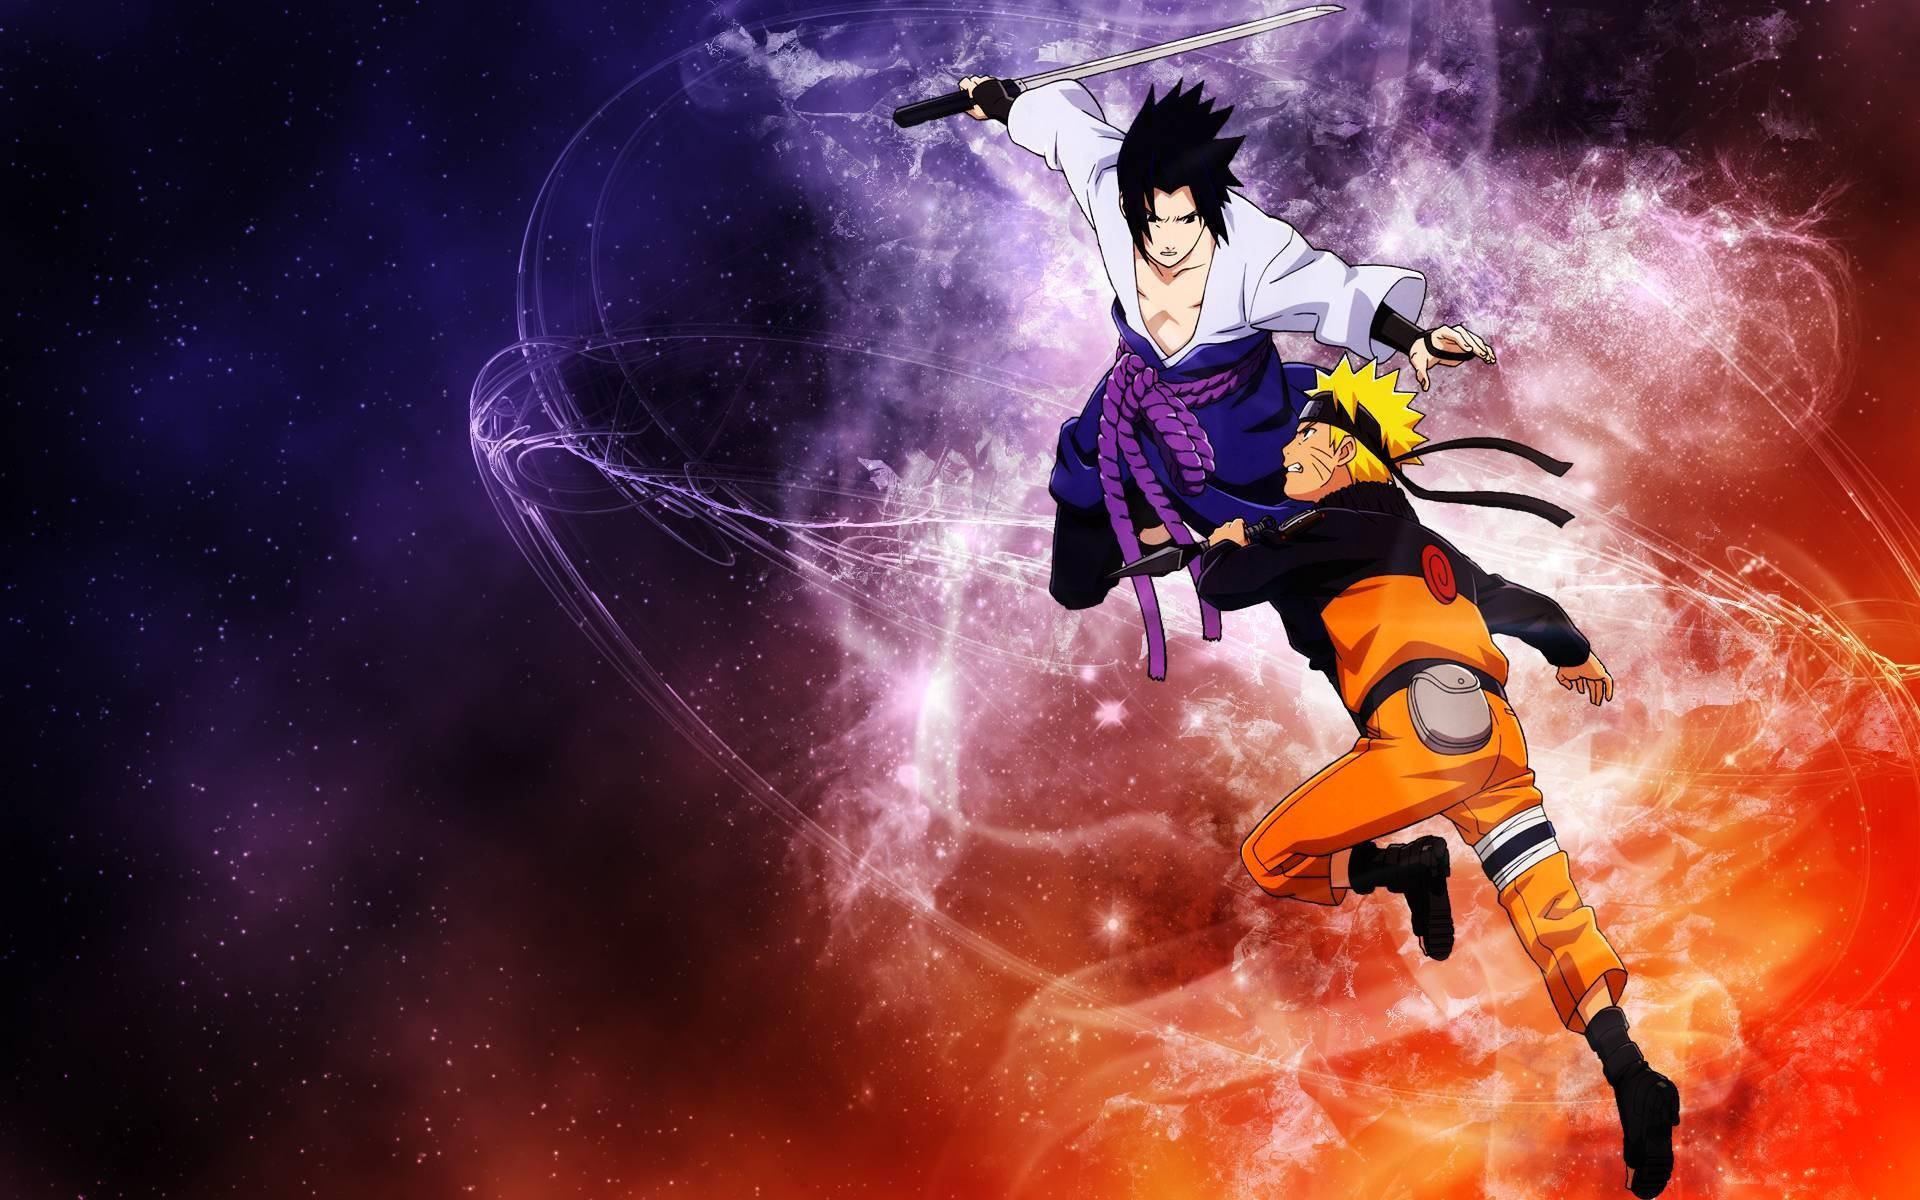 Full HD p Naruto Wallpapers HD Desktop Backgrounds x   HD Wallpapers    Pinterest   Naruto wallpaper, Hd wallpaper and Wallpaper